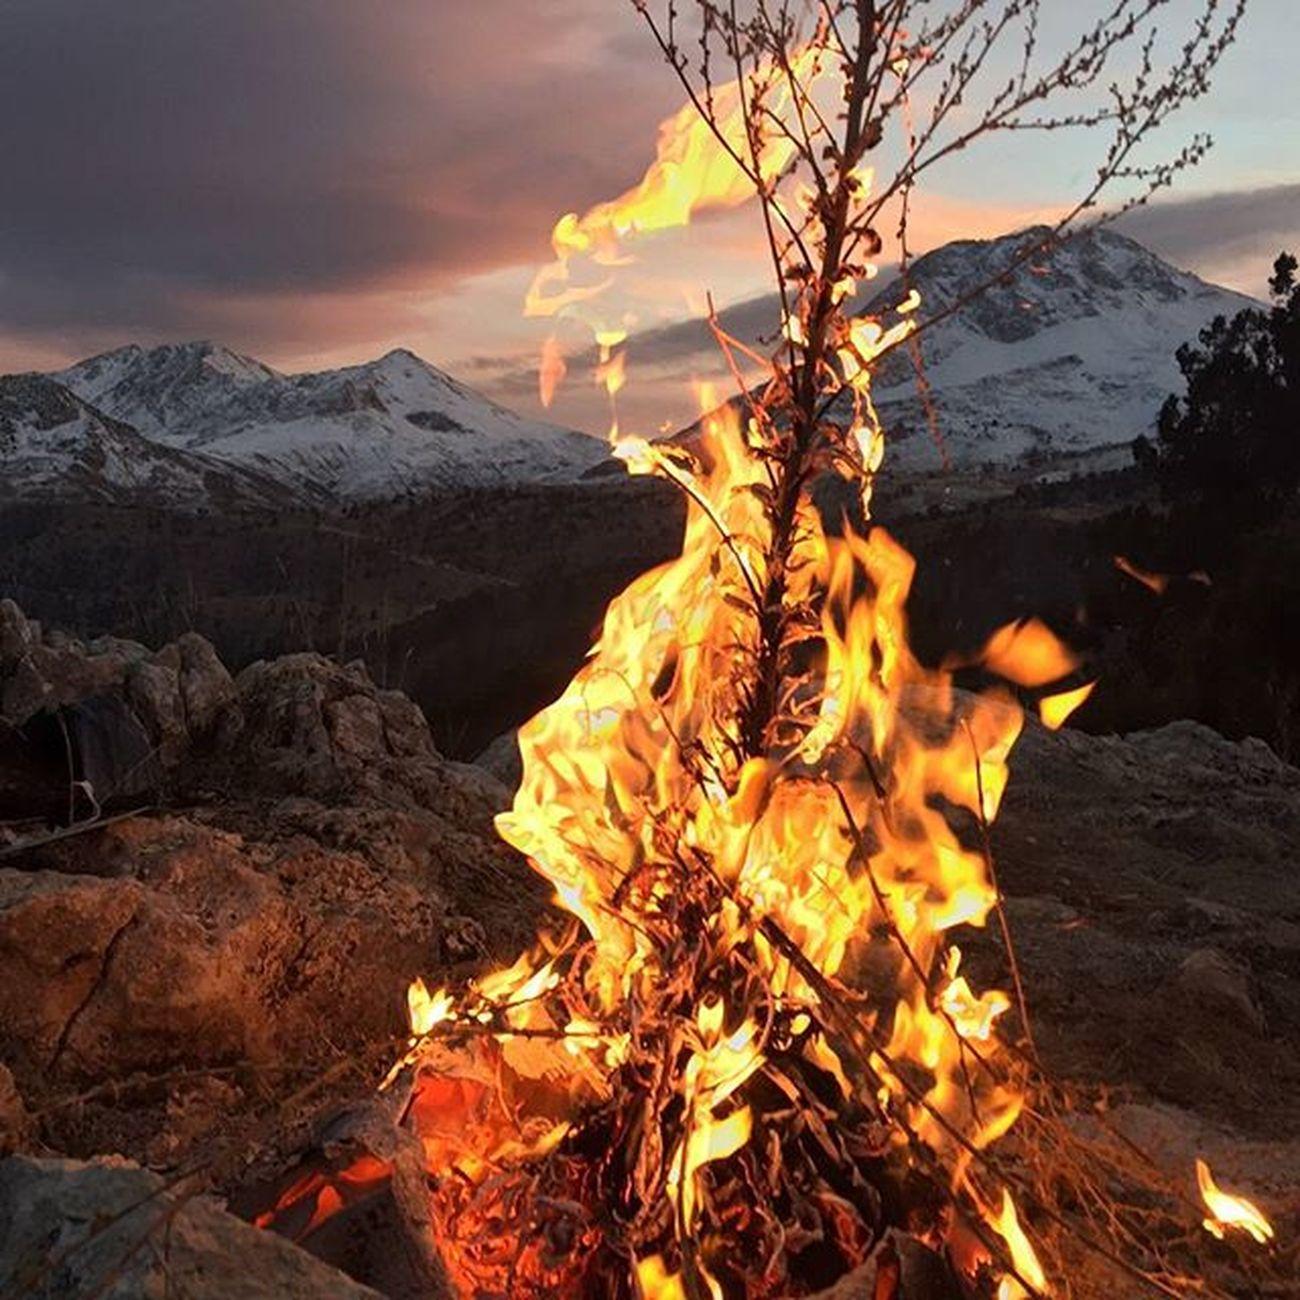 Ateş Saklıkent Doğa Mountain Fire Snow Nature Konyaaltı Sıcak Instagood Instaturk Antalya Sunday Nofilter